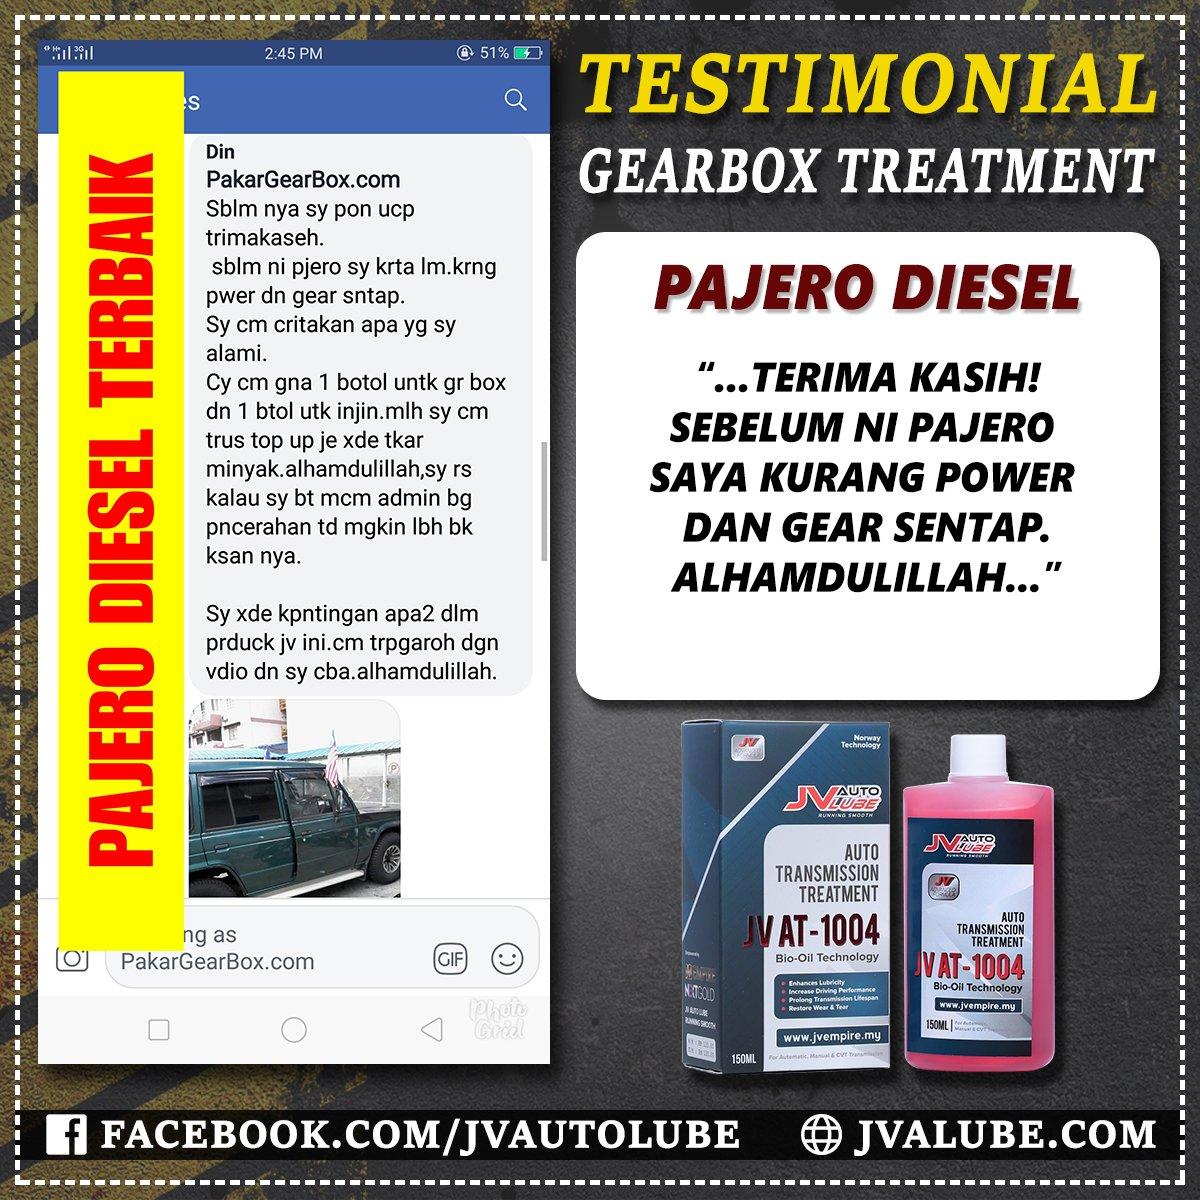 Testimoni AT 013 - Toyota Pajero Diesel